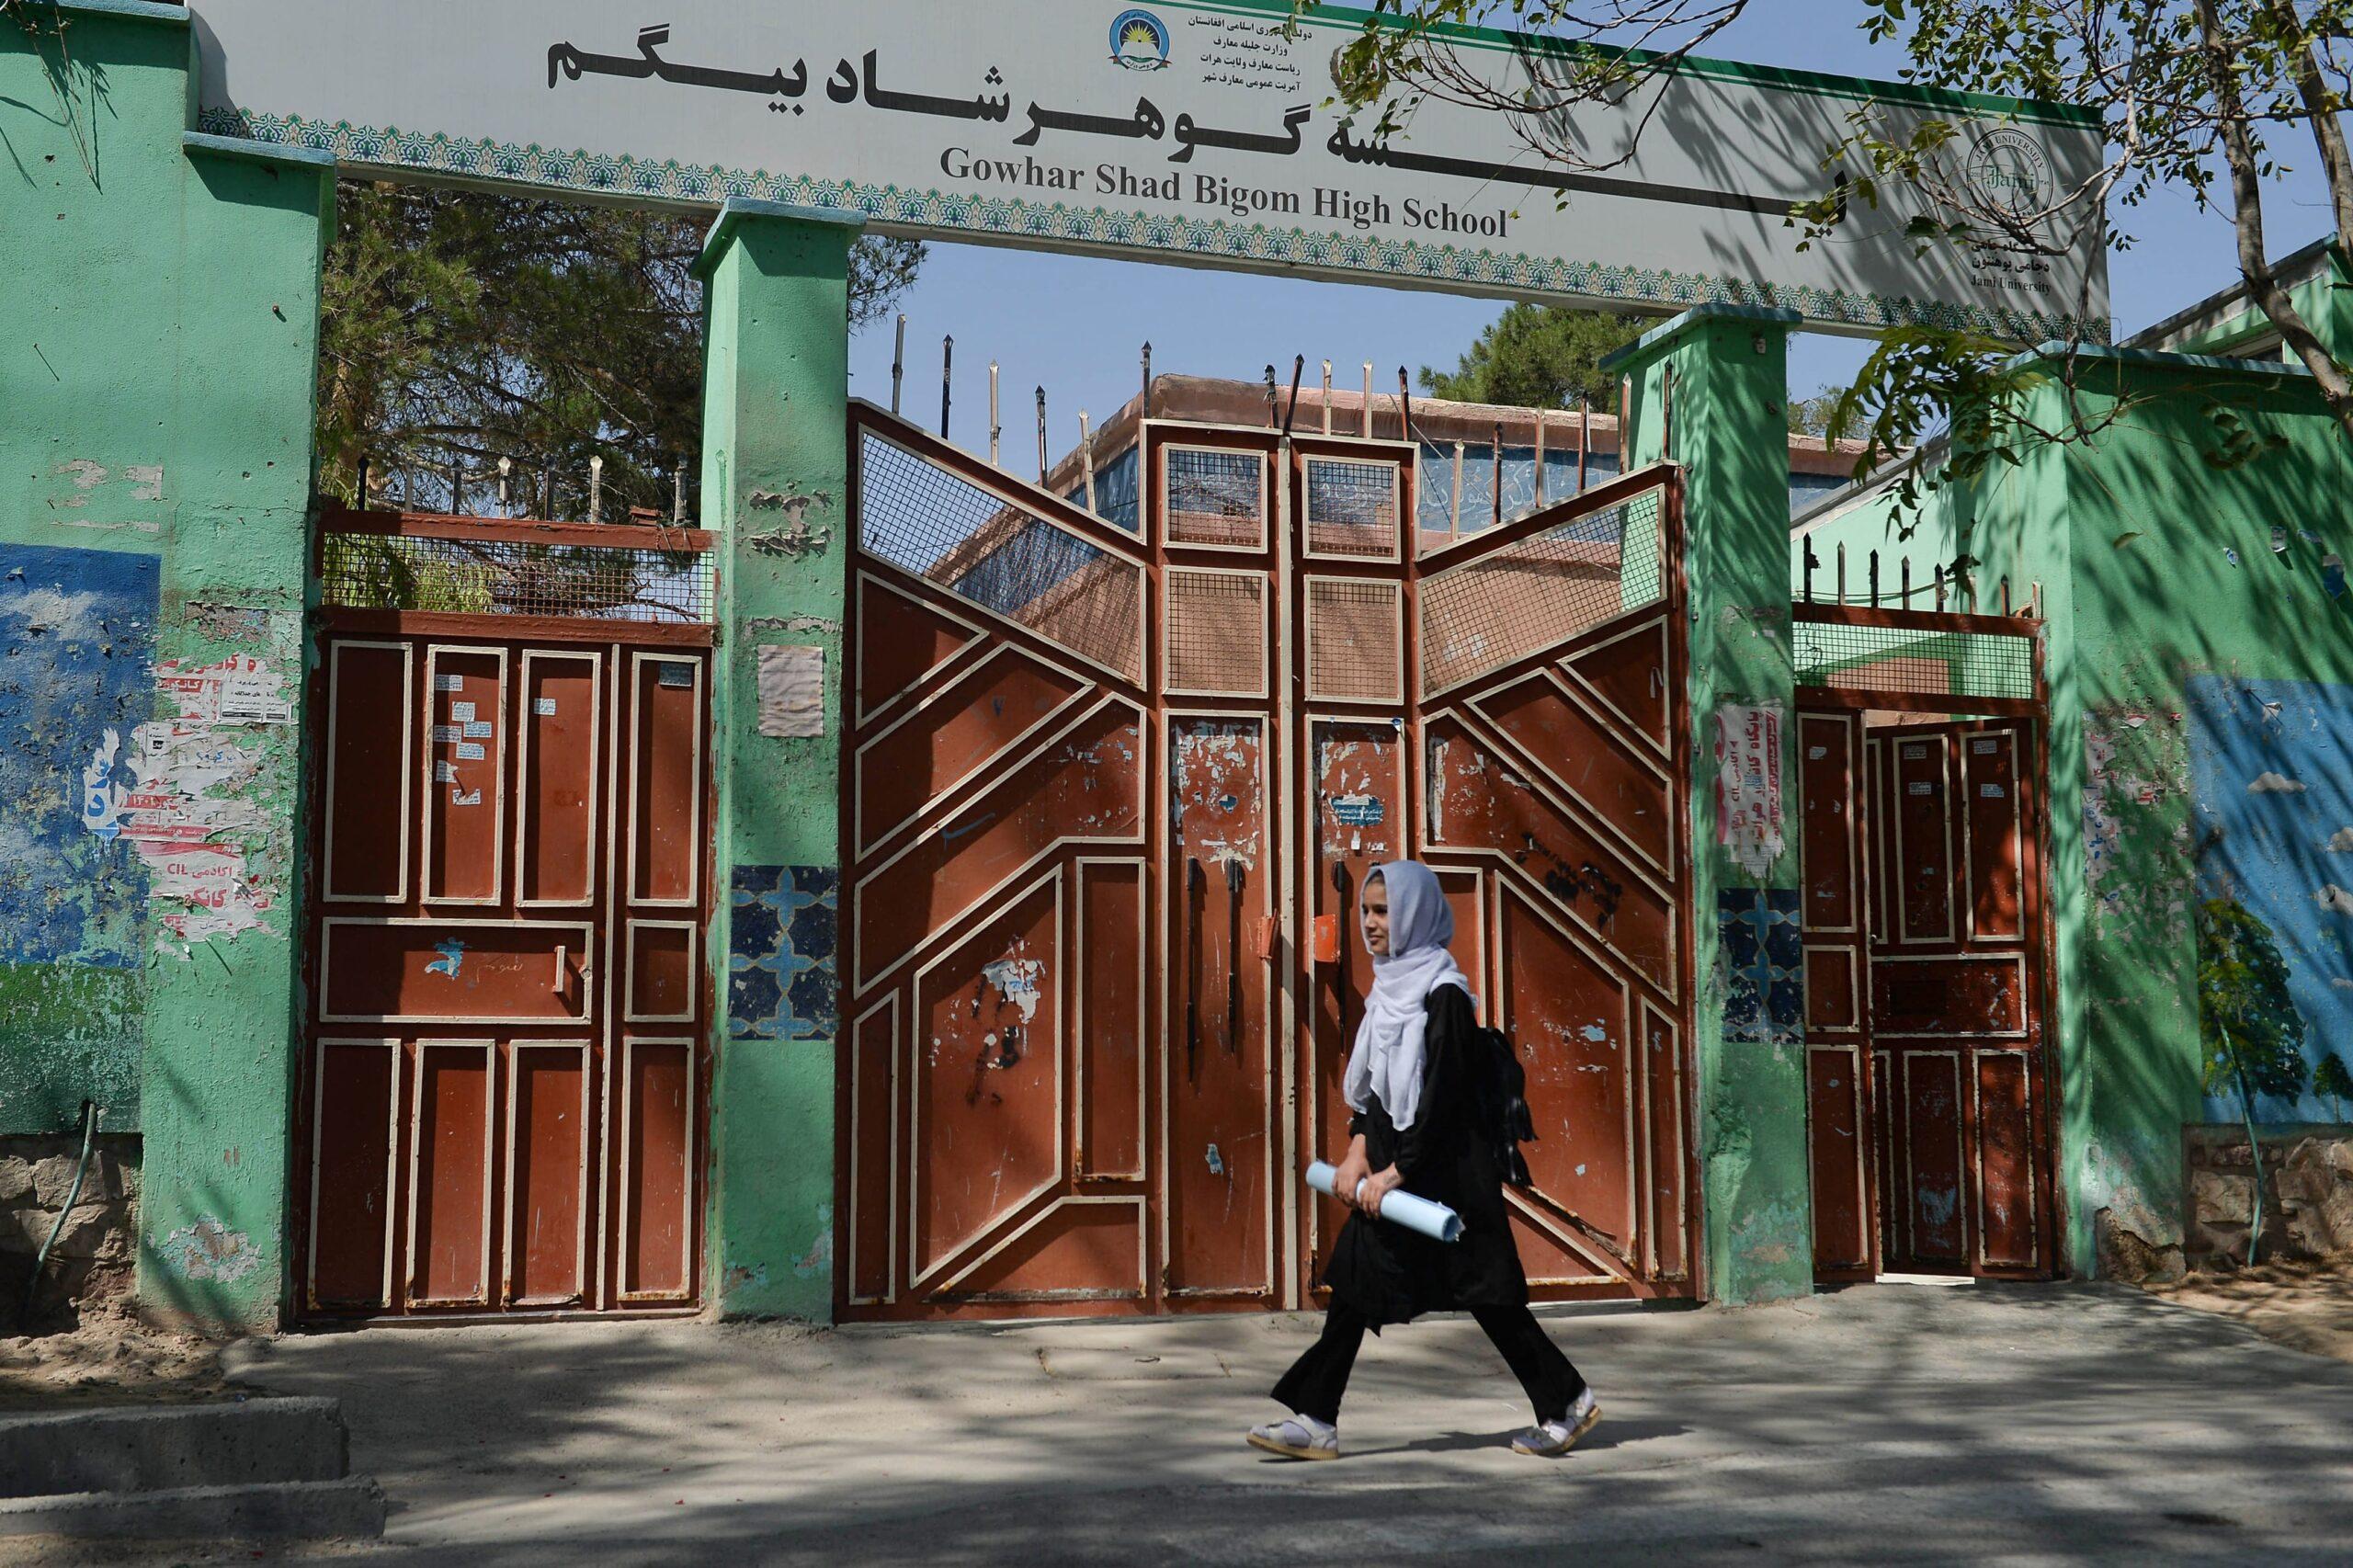 Afghanistan: Taliban must allow girls to return to school immediately – new testimony